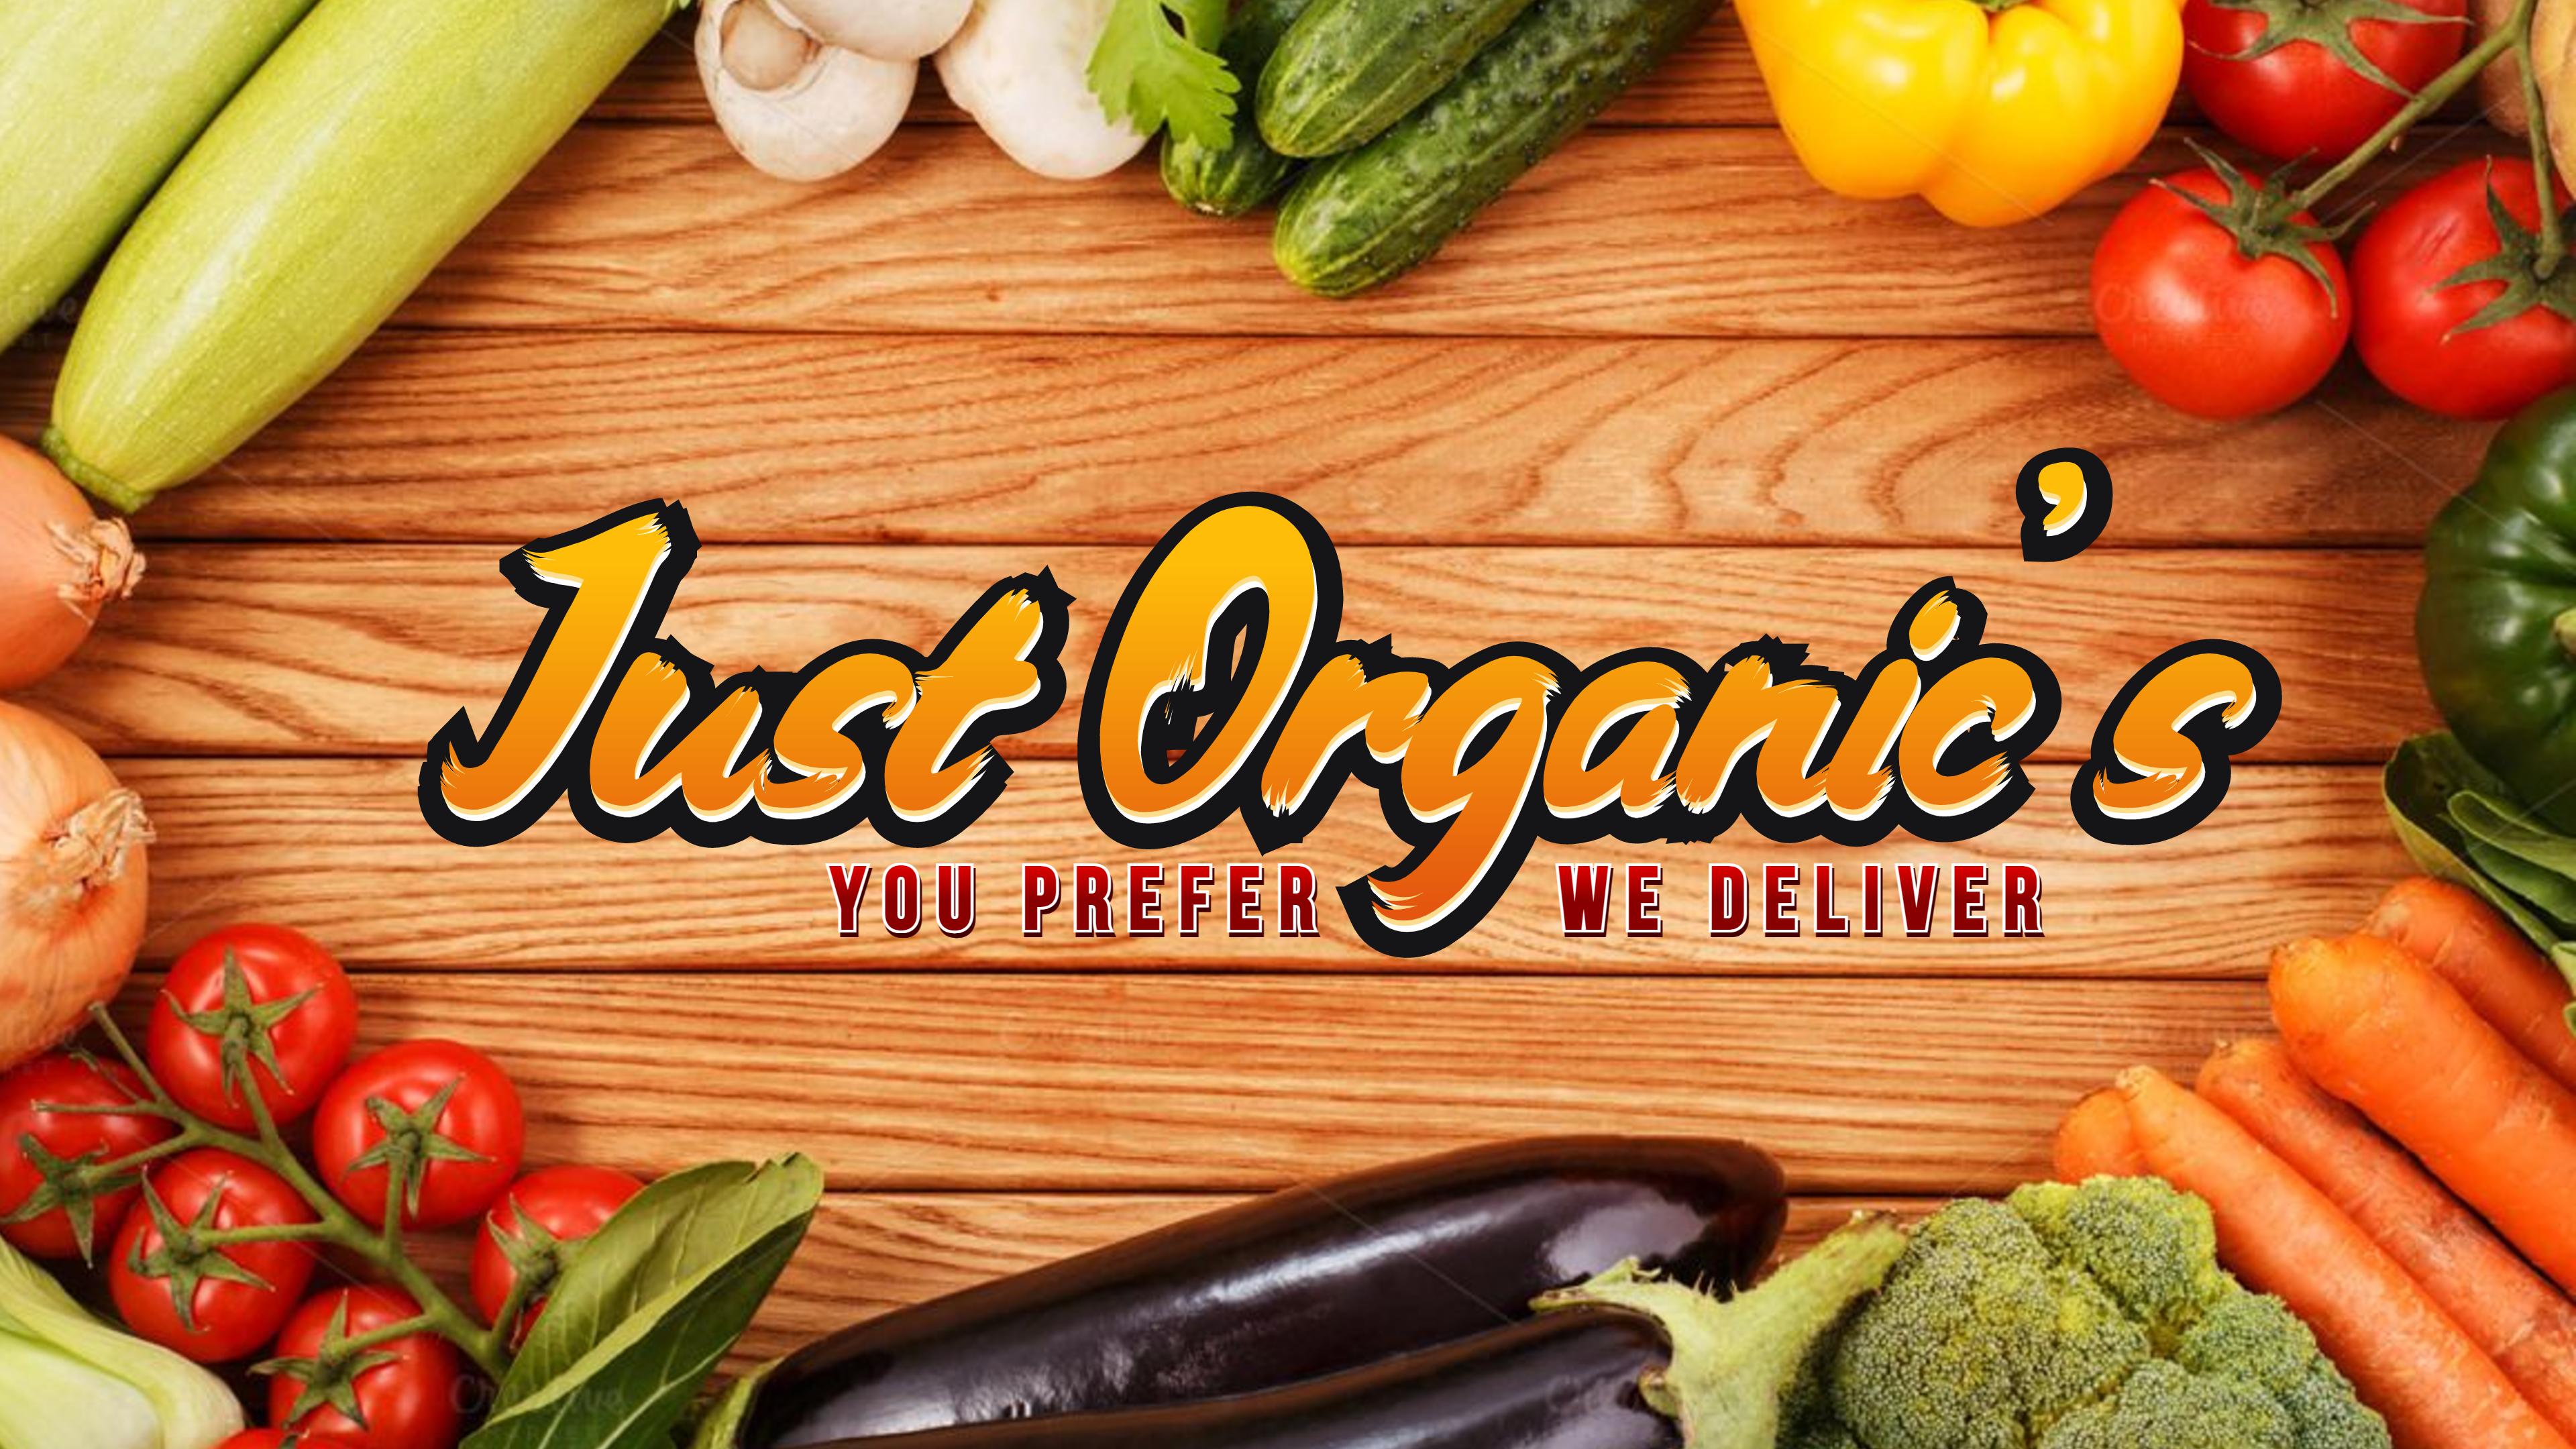 Just Organic's